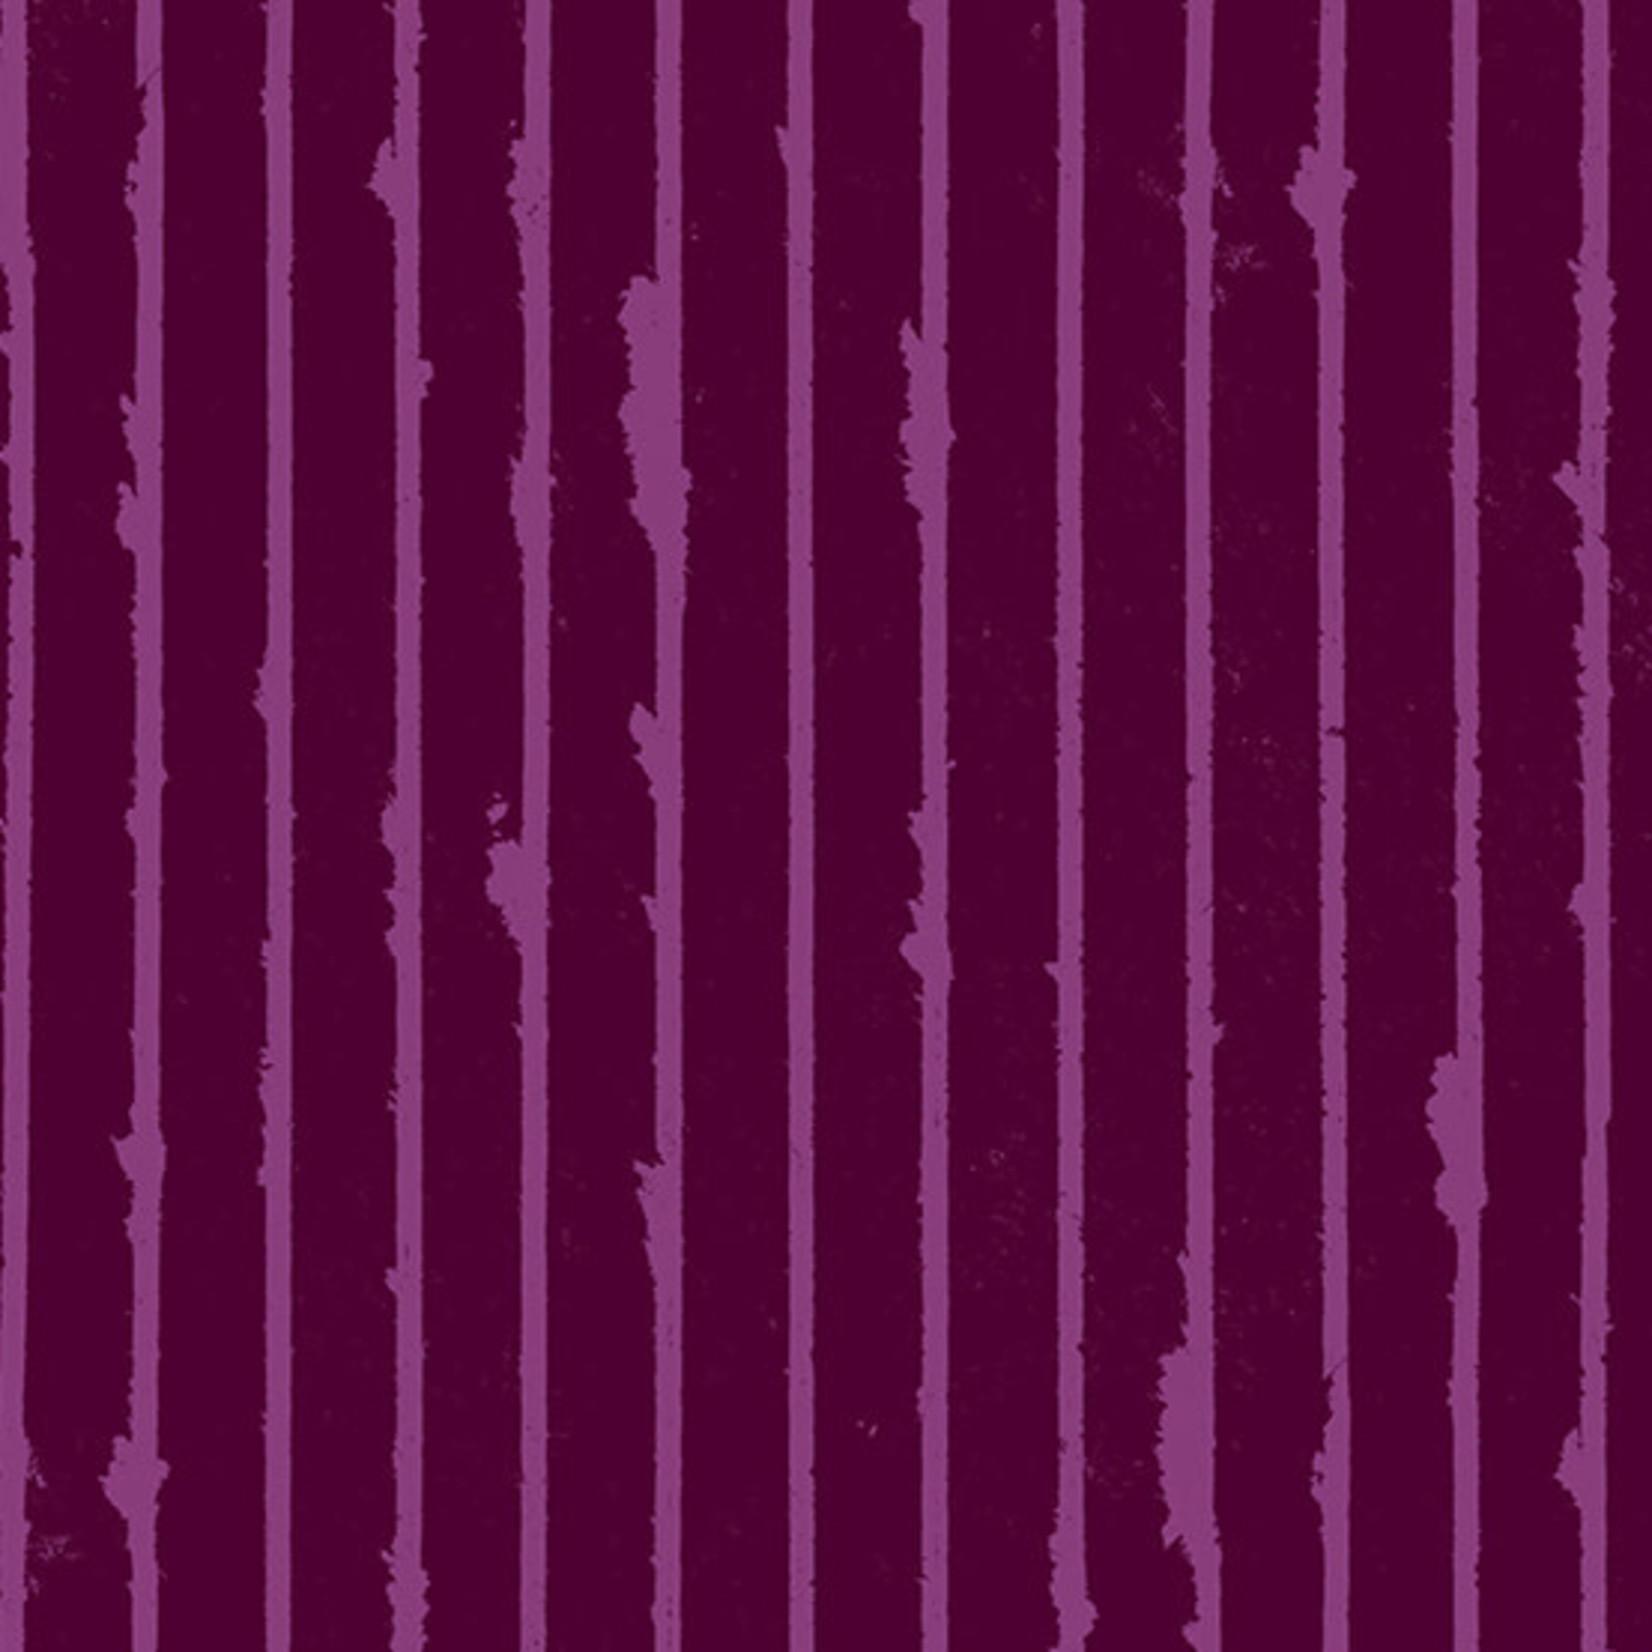 Andover Prism, Stripe - Mulled Wine, per cm or $20/m